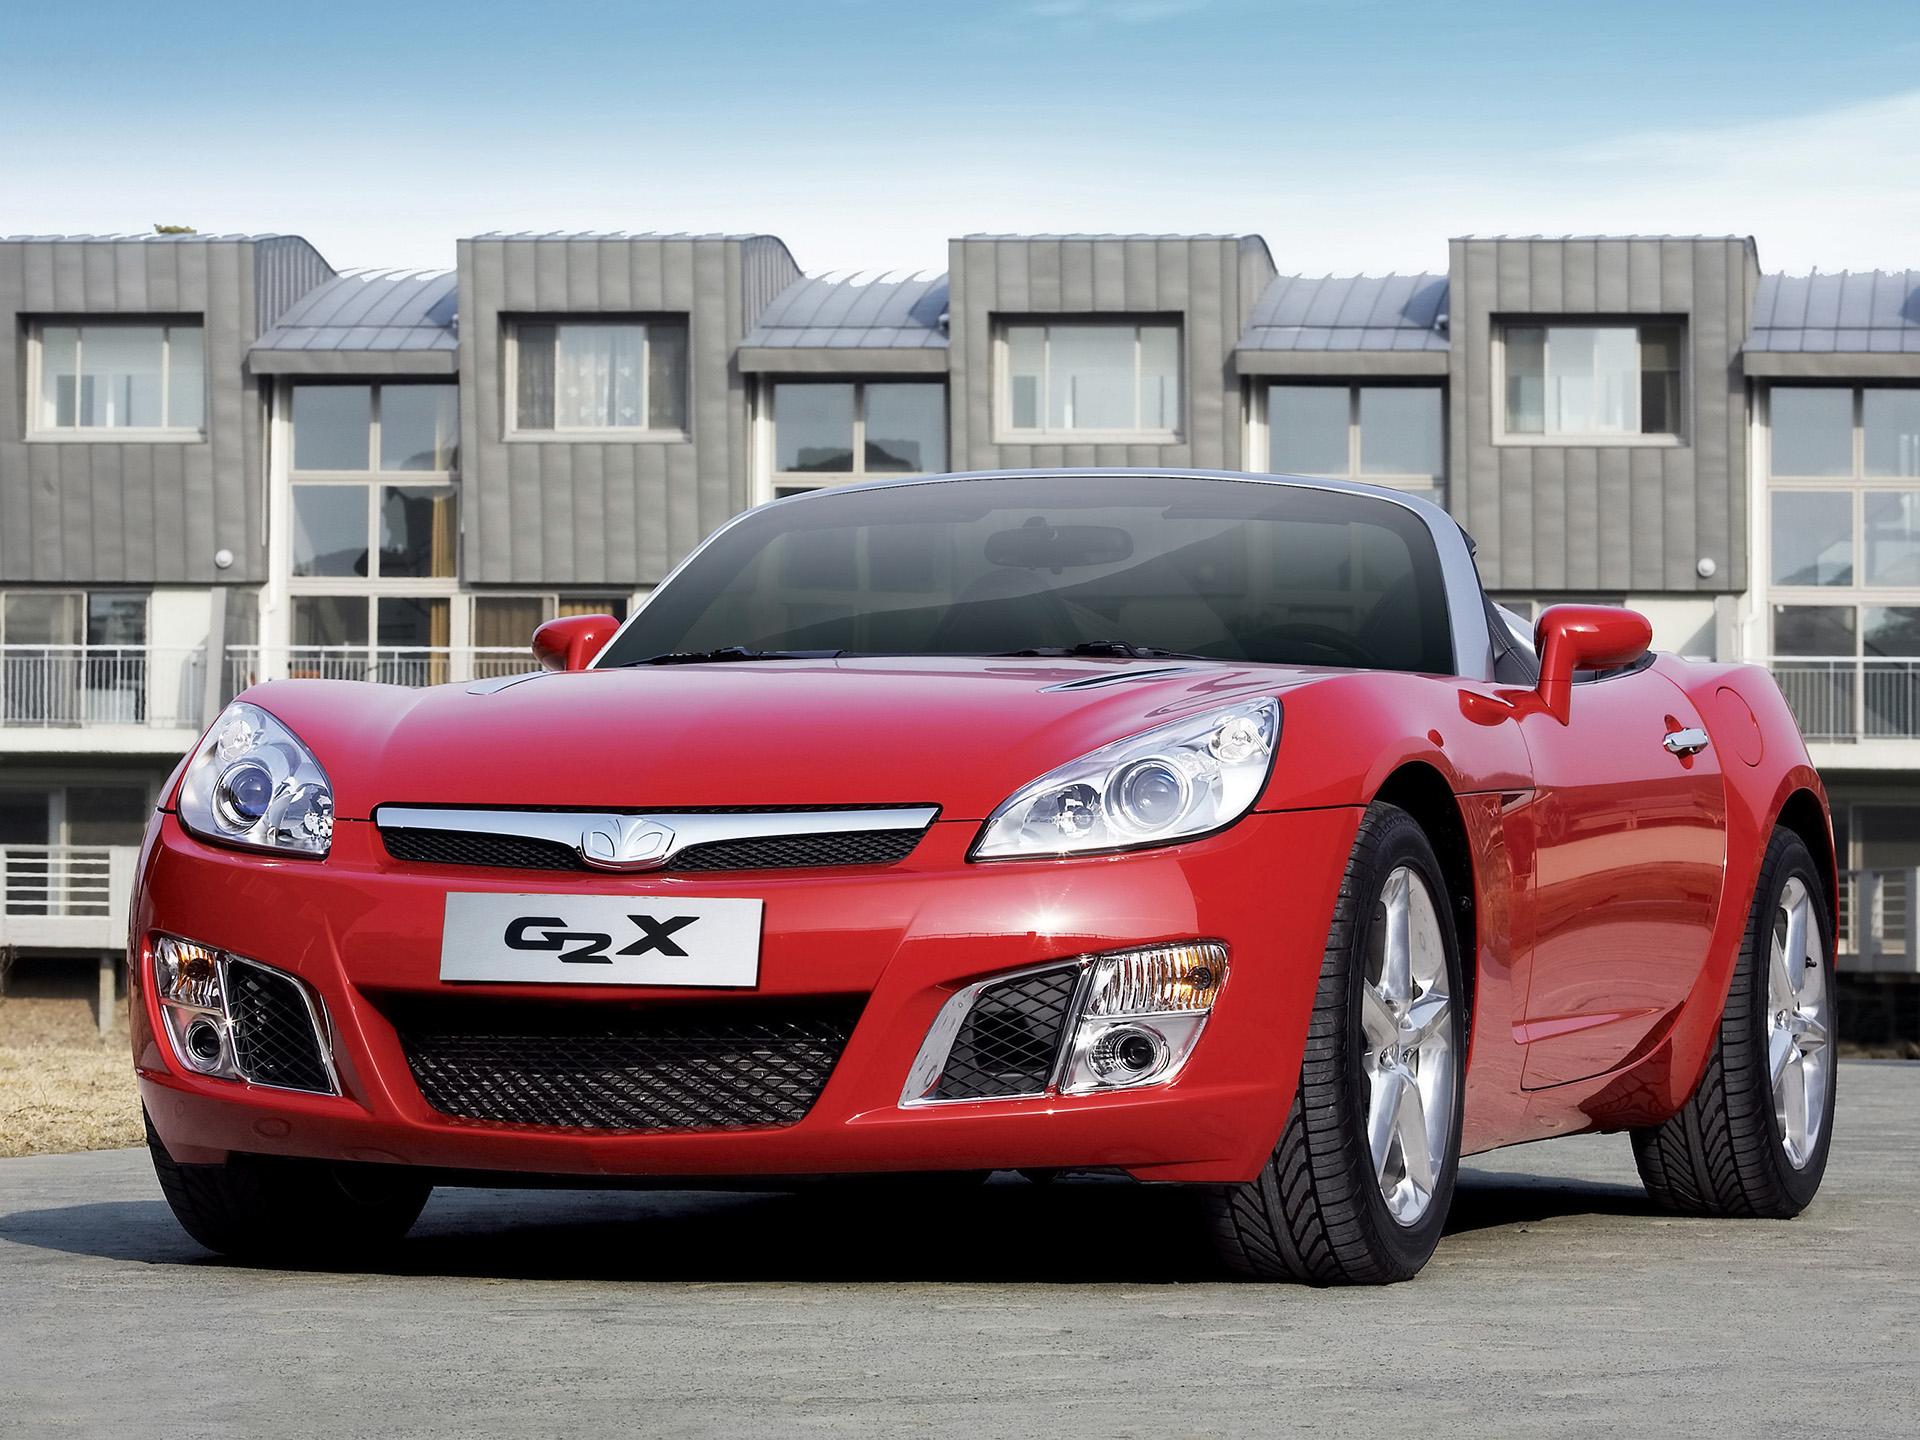 2007-GM-Daewoo-G2X-Front-Angle-1920x1440-1-